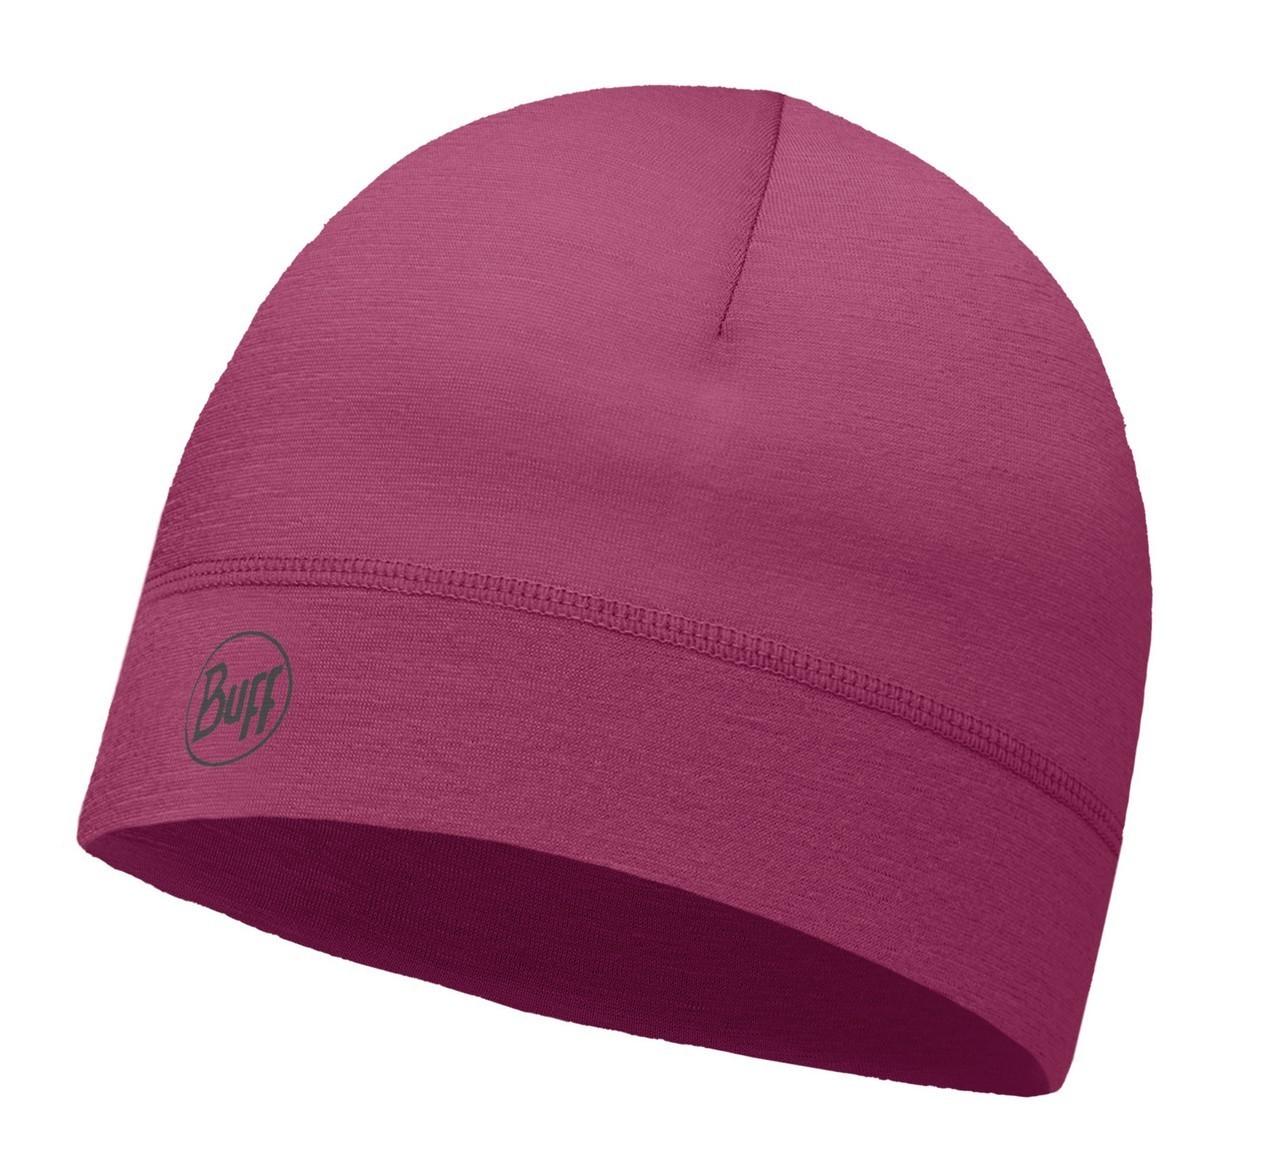 Тонкая спортивная шапка Buff Solid Amaranth Purple